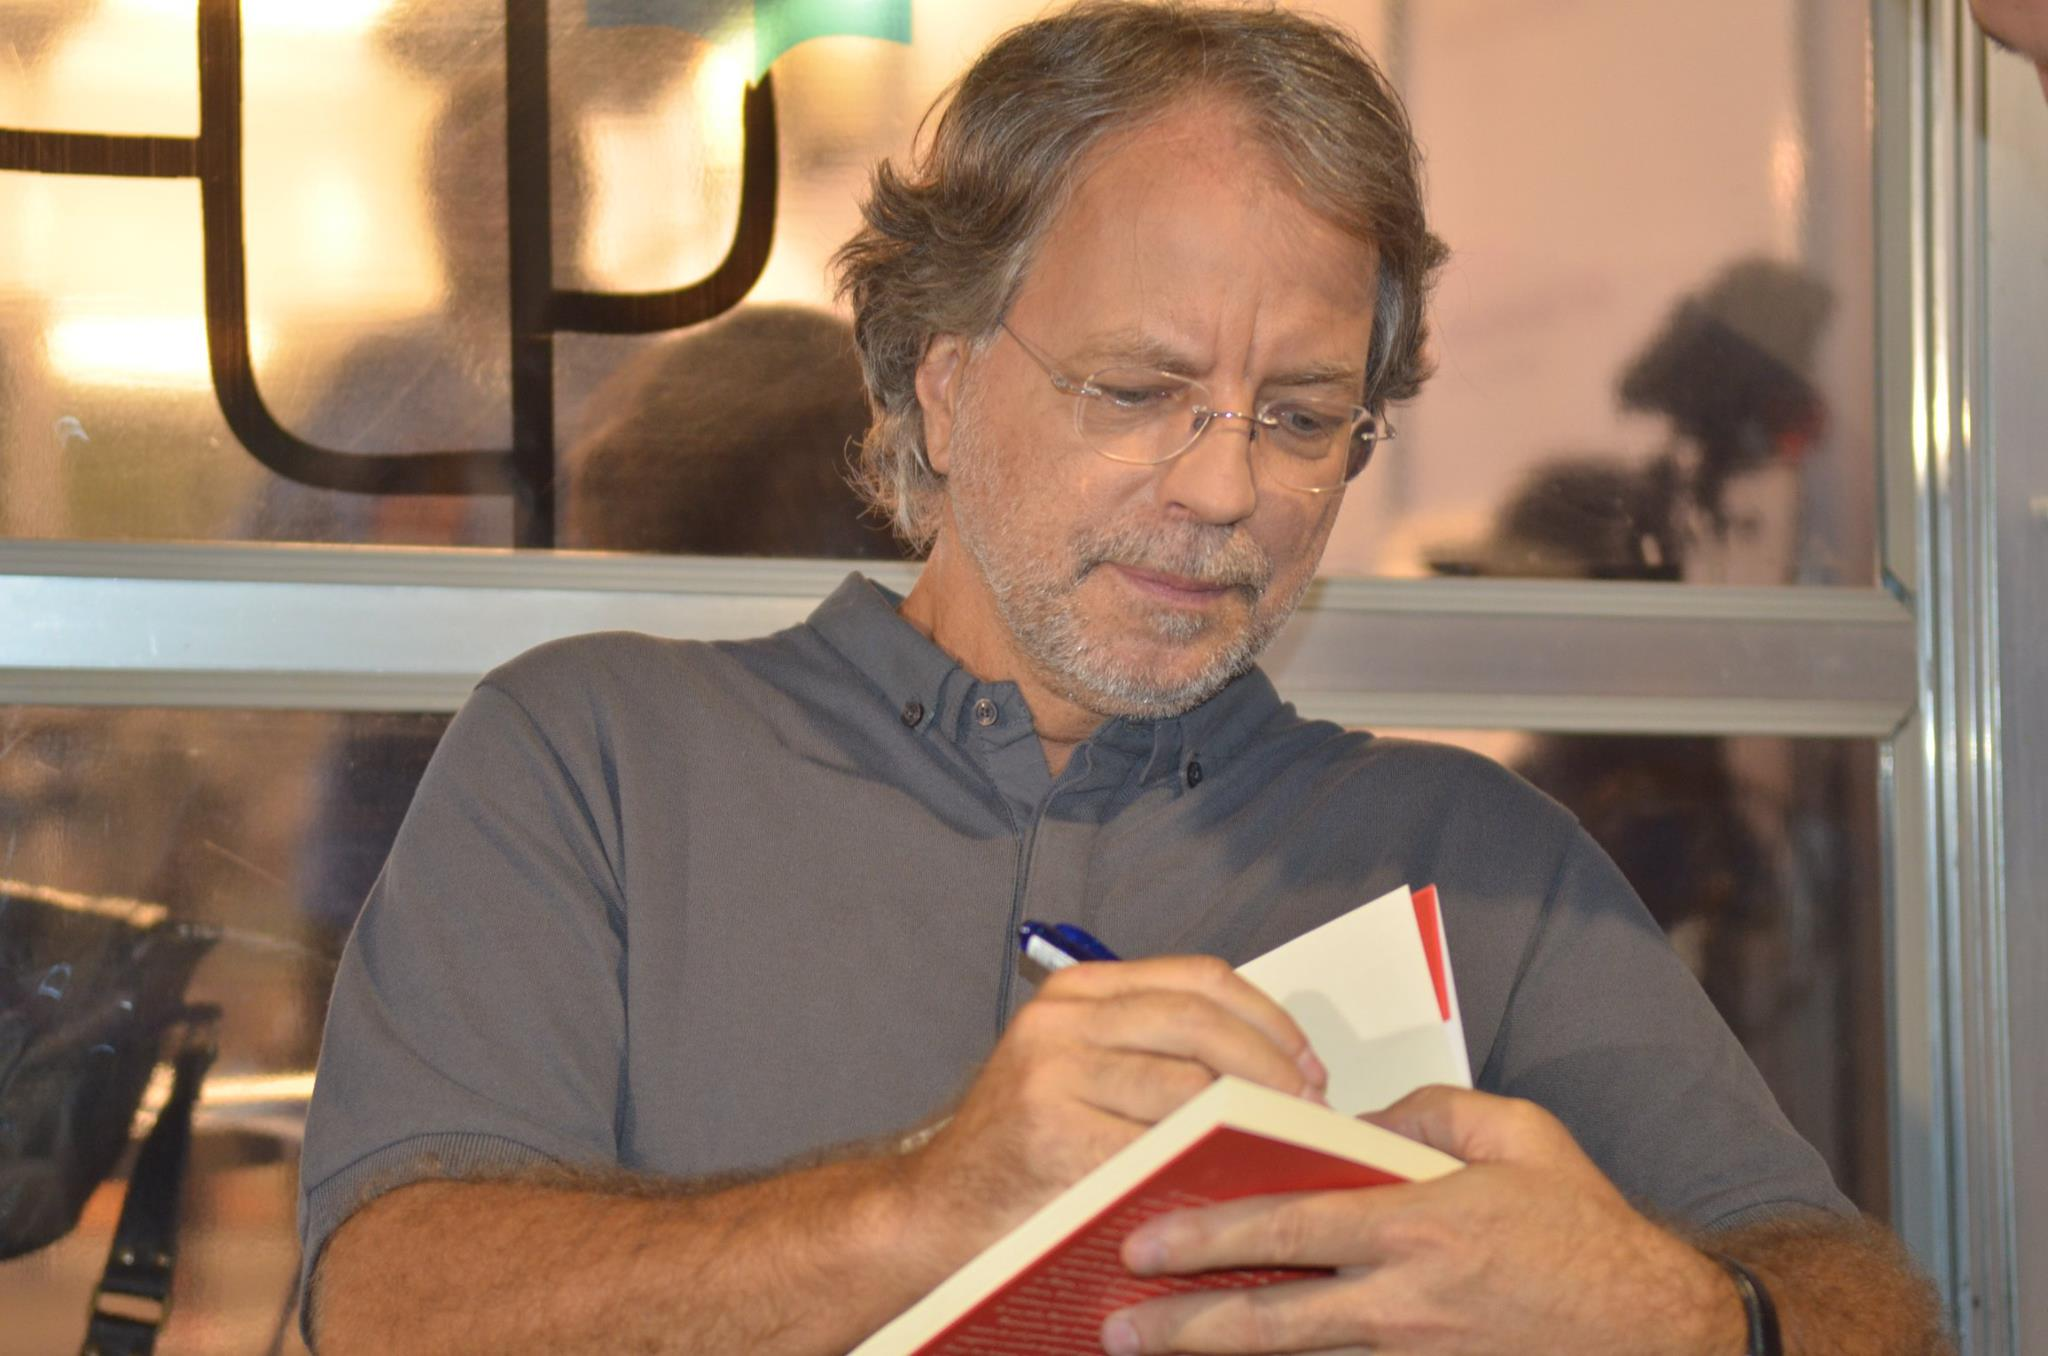 Mia Couto venceu o prémio literário francês Albert Bernard 2020